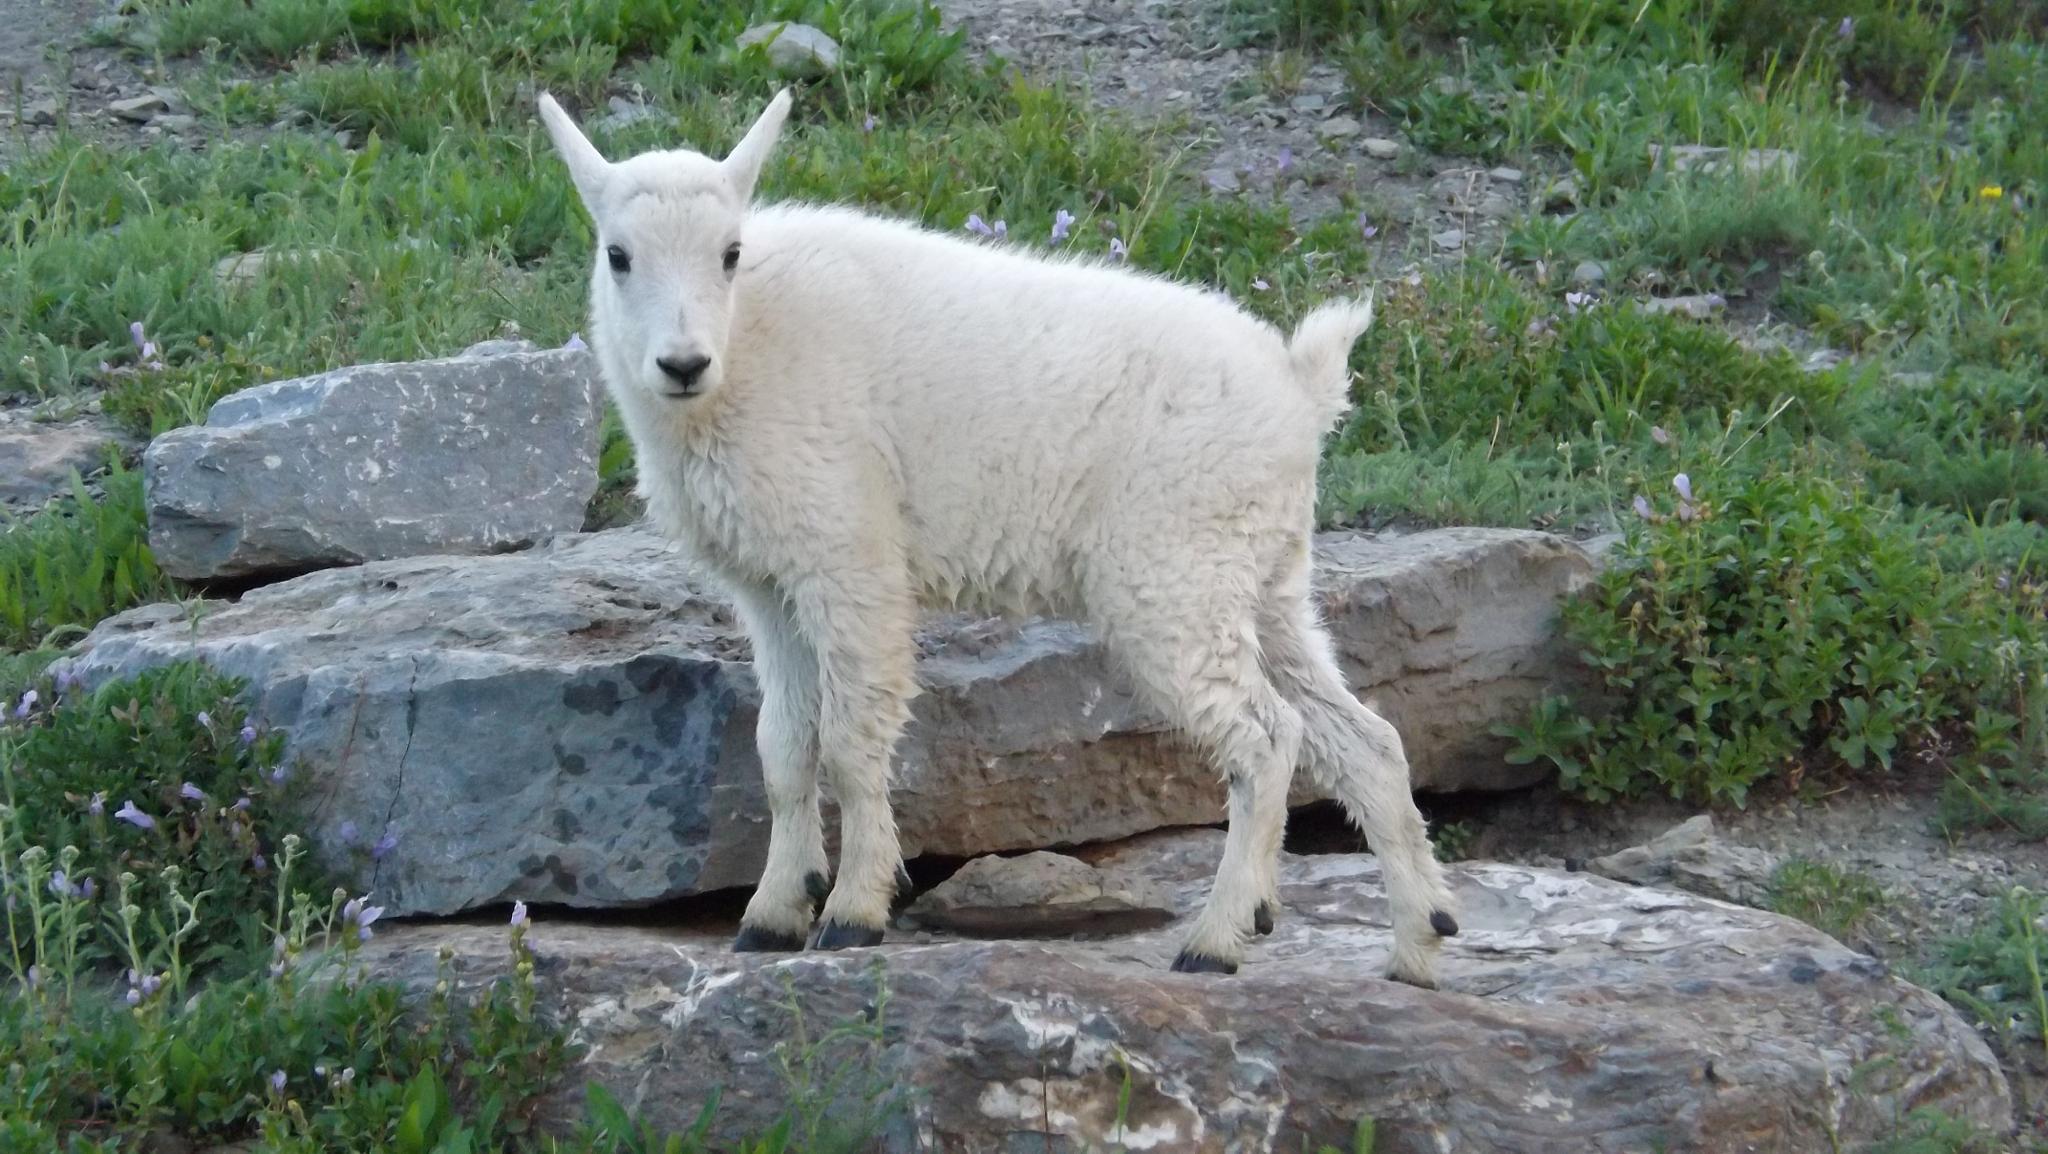 Precious  White Mountain Goat by MissRenee40